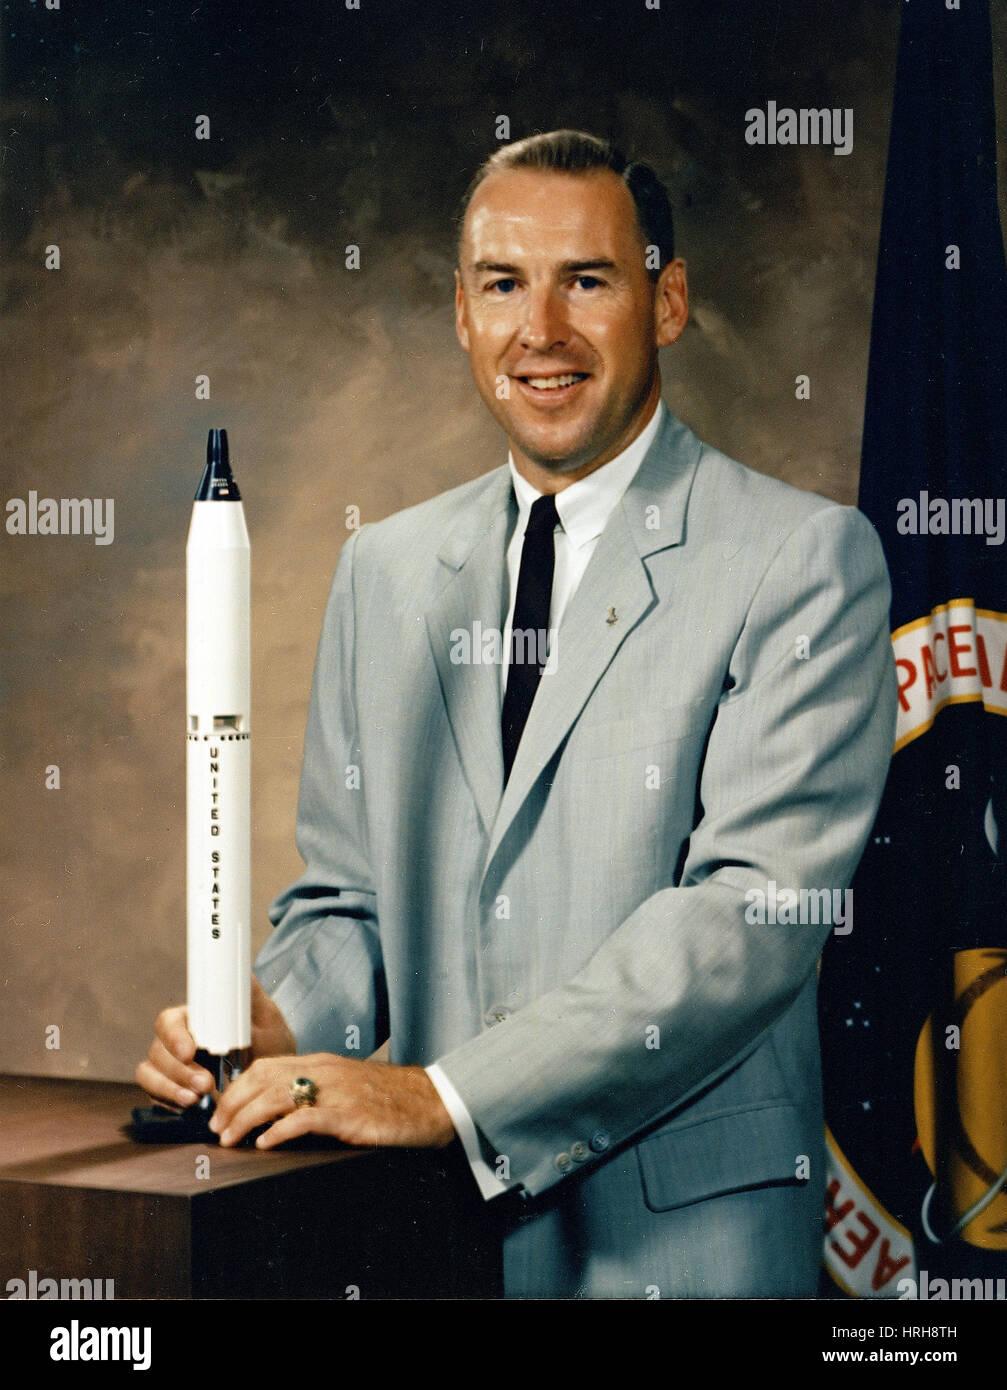 Astronaut James Lovell - Stock Image